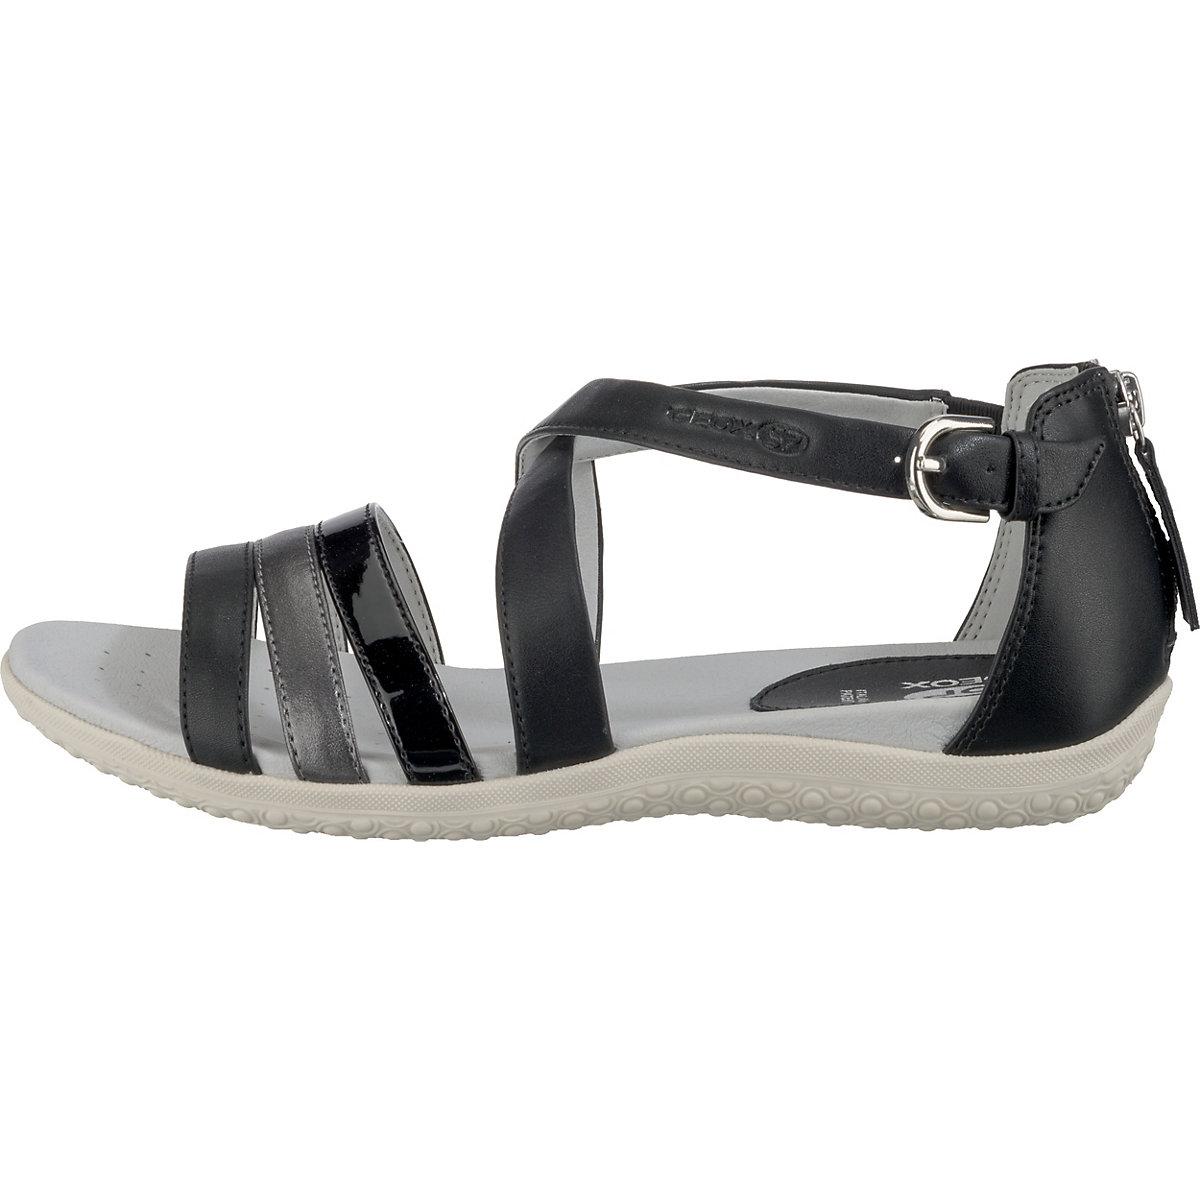 Geox, Komfort-sandalen, Schwarz/grau